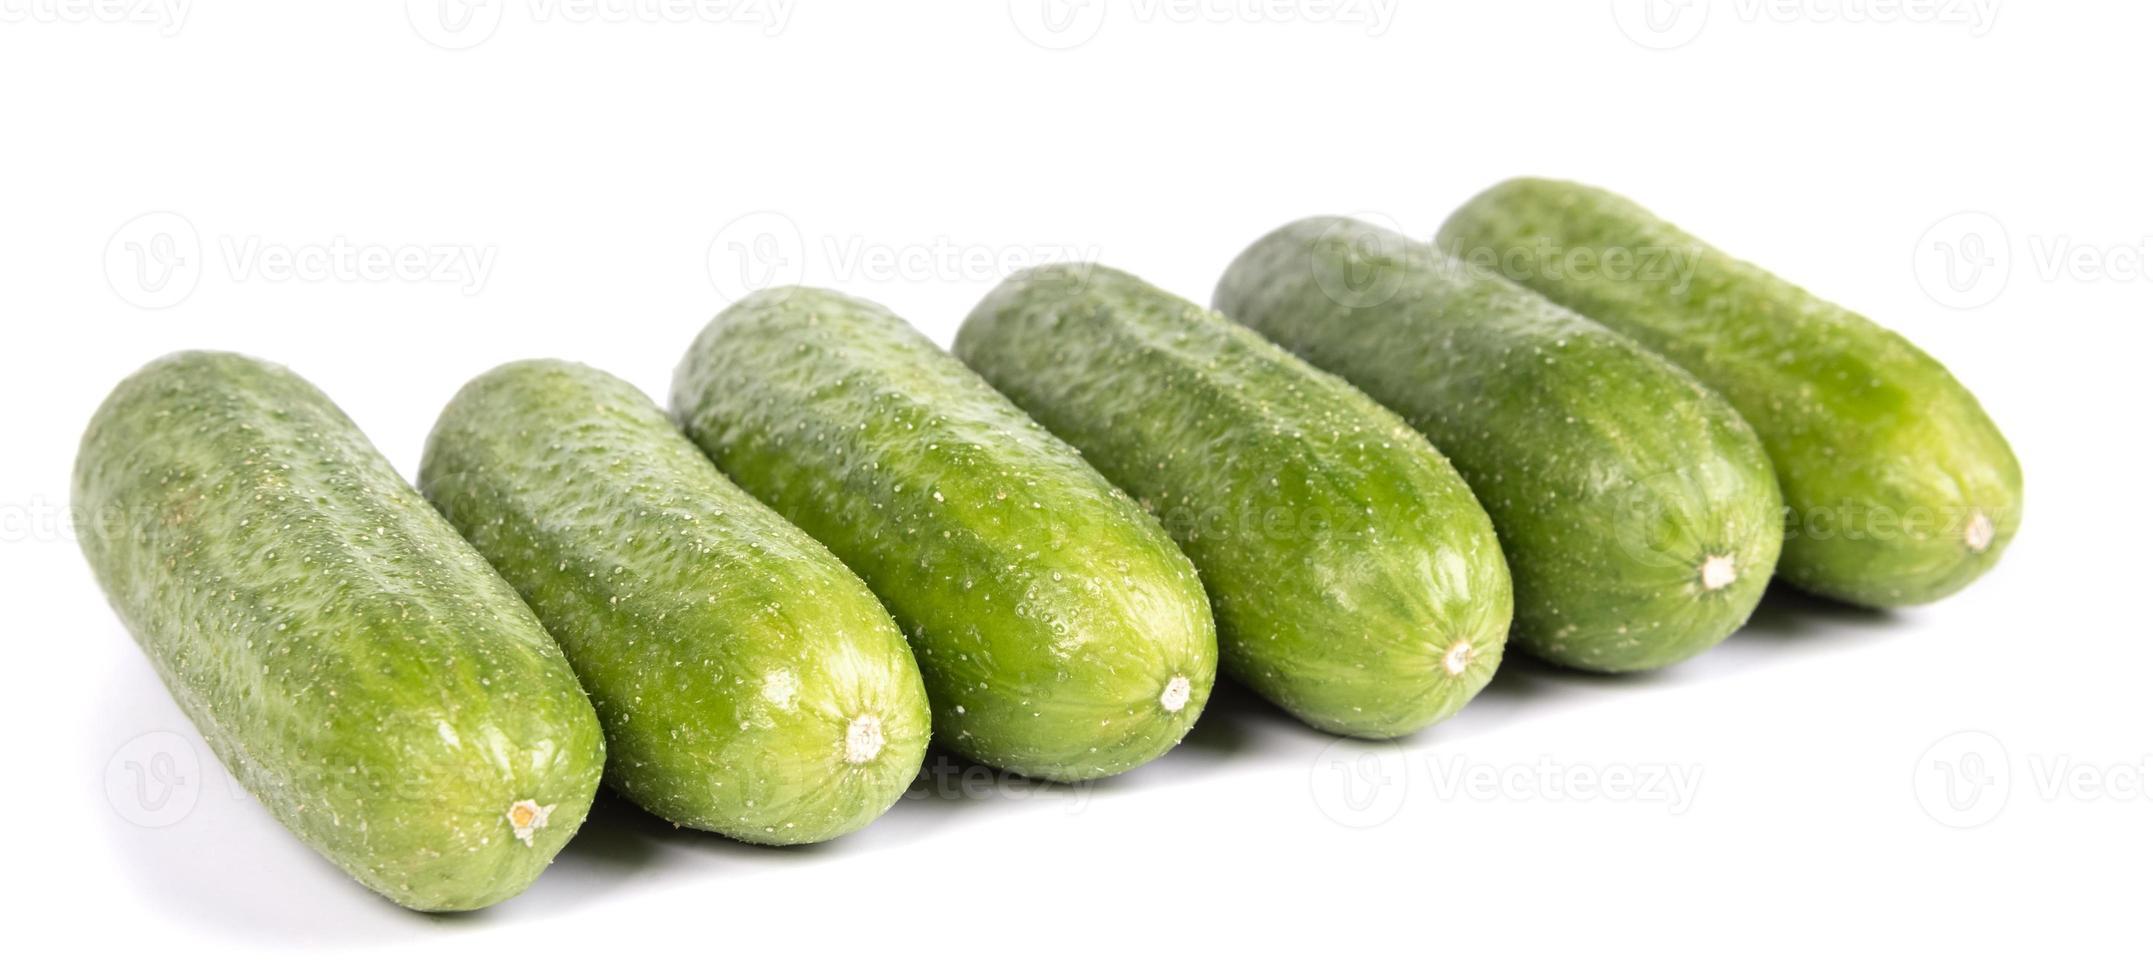 concombre vert photo